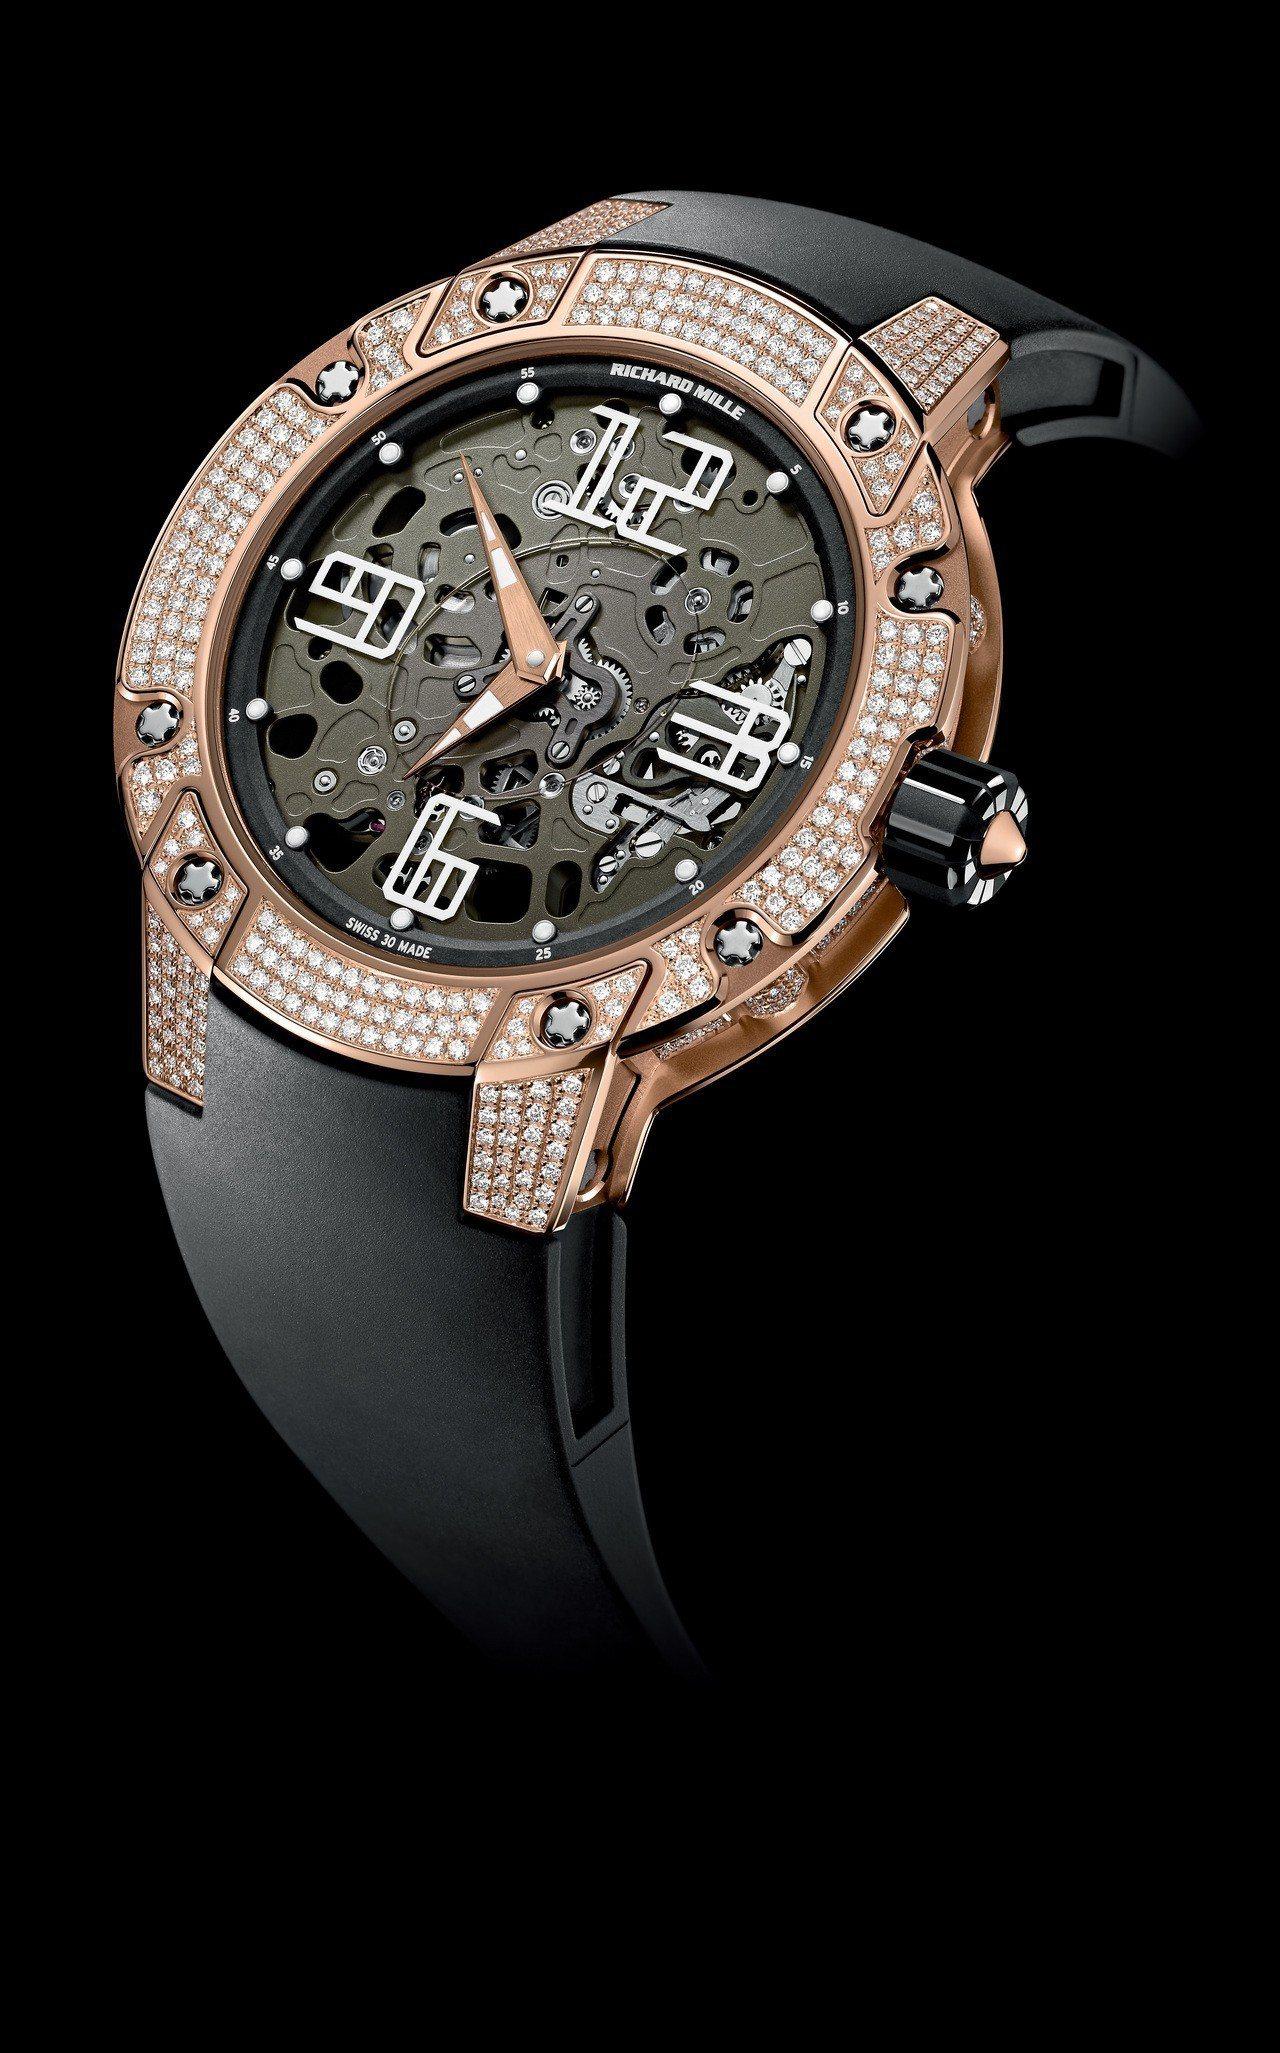 RICHARD MILLE RM033超薄镶钻腕表,18K玫瑰金表壳,搭载镂空R...